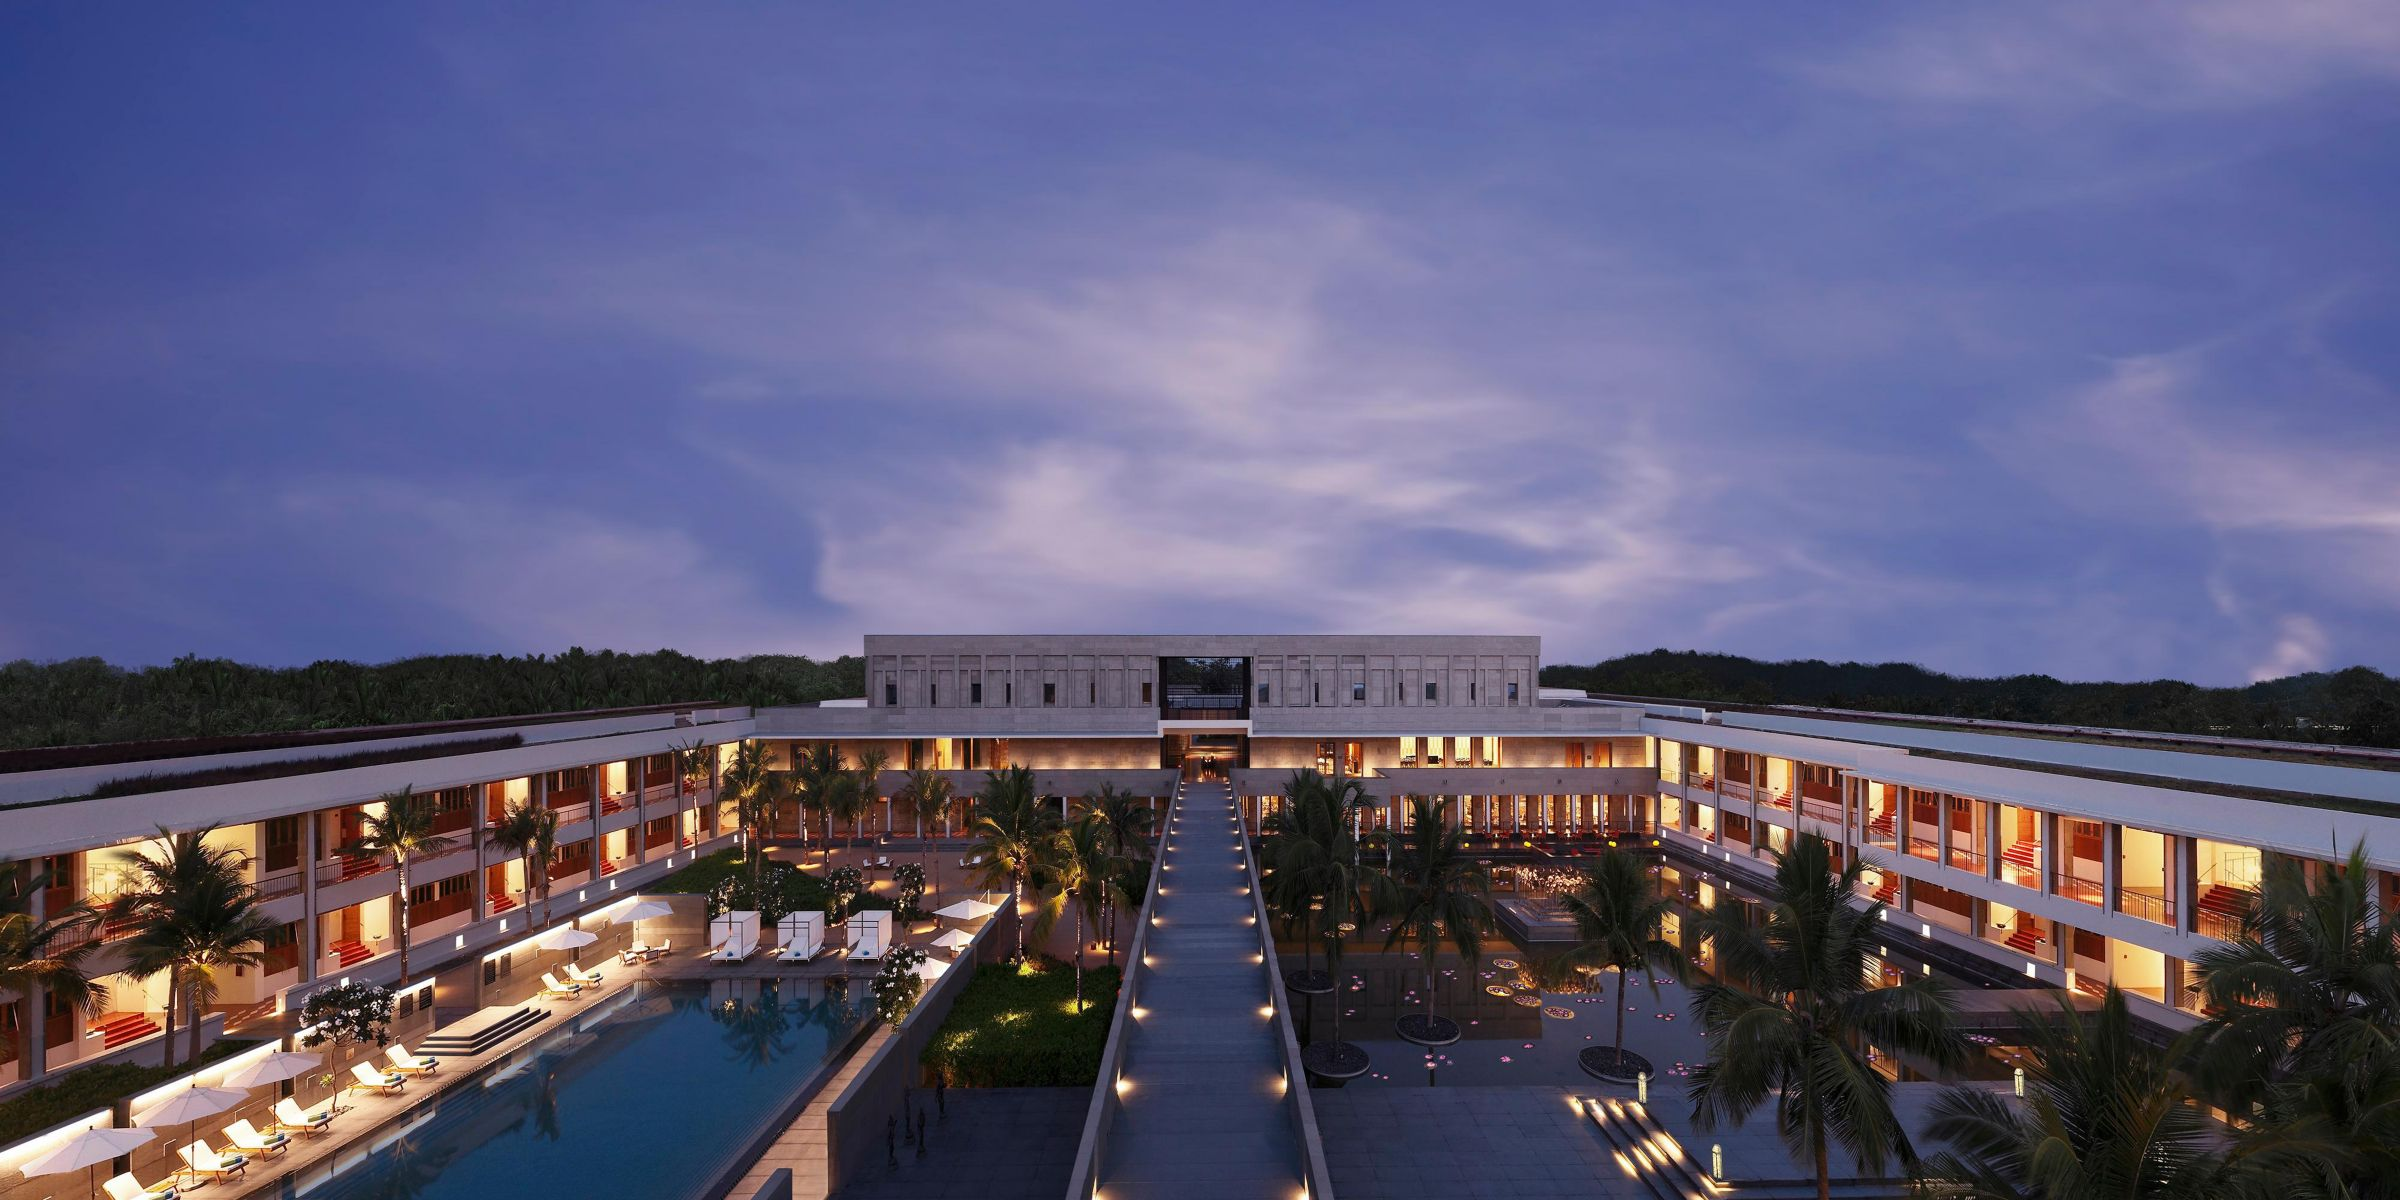 Intercontinental Chennai Mahabalipuram Resort Facade Exterior Feature Hotel